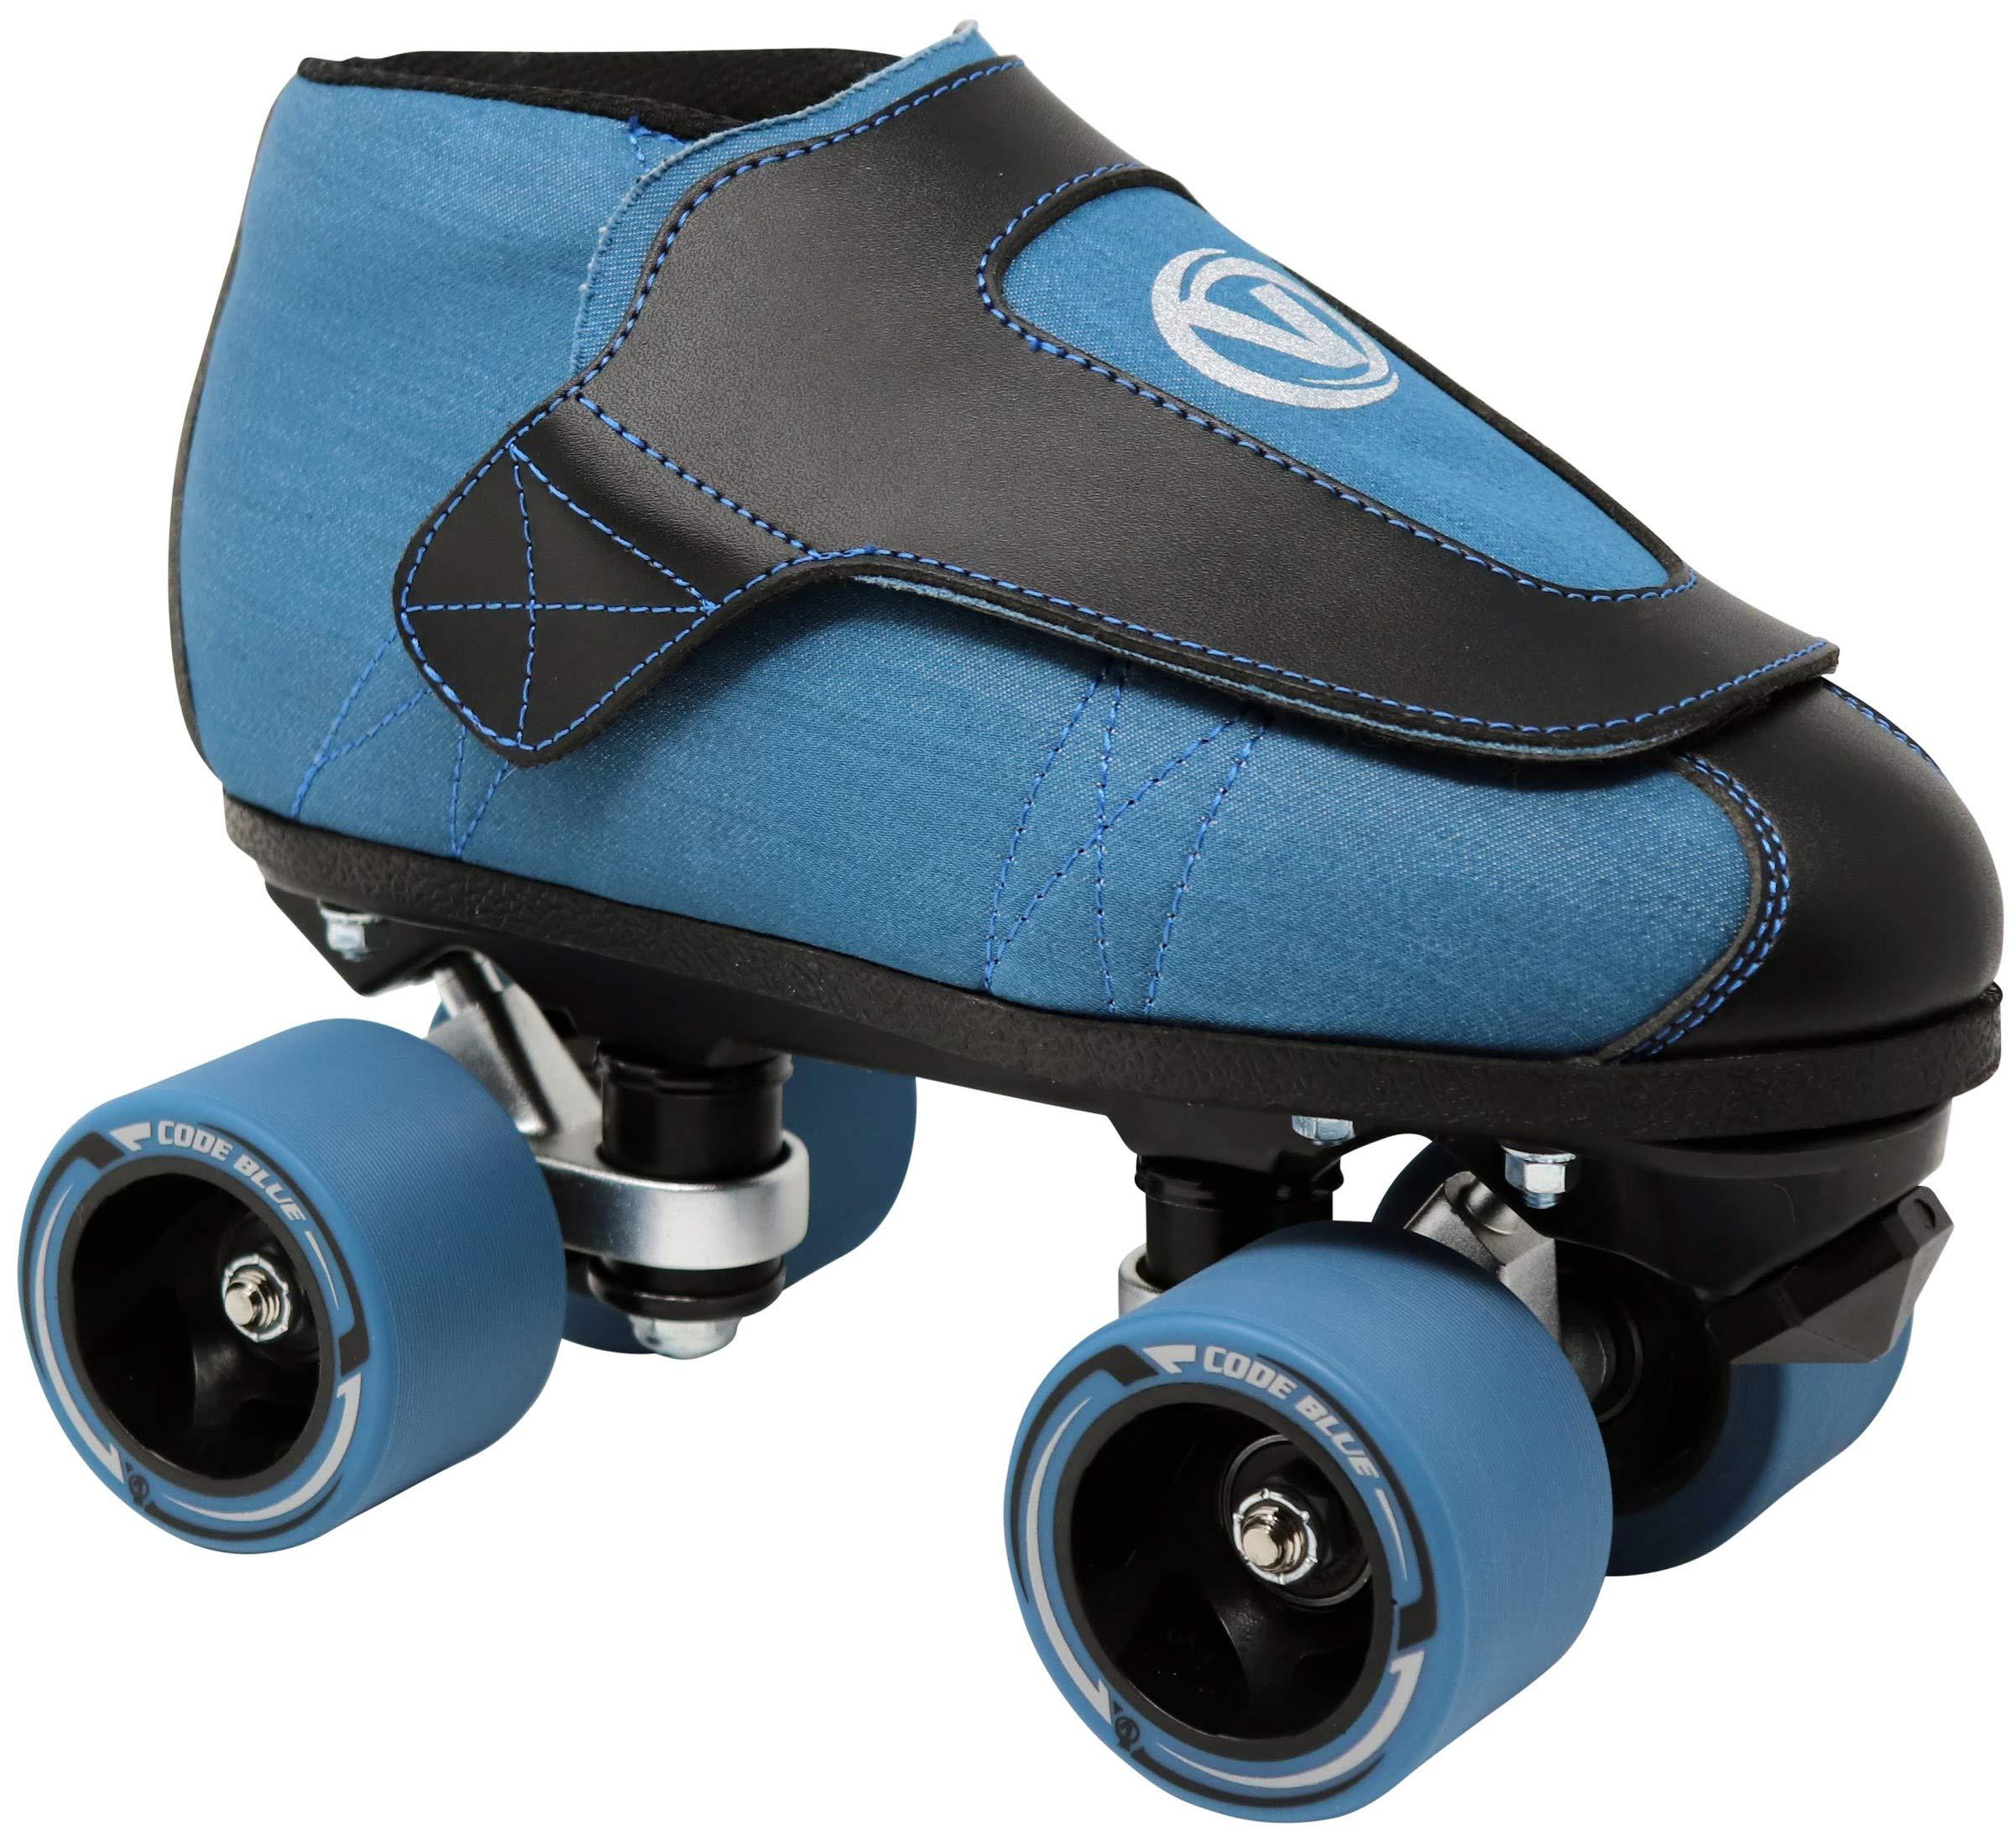 VNLA Code Blue Jam Skate - Mens & Womens Speed Skates - Quad Skates for Women & Men - Adjustable Roller Skate/Rollerskates - Outdoor & Indoor Adult Quad Skate - Kid/Kids Roller Skates (Size 4) by VNLA (Image #1)